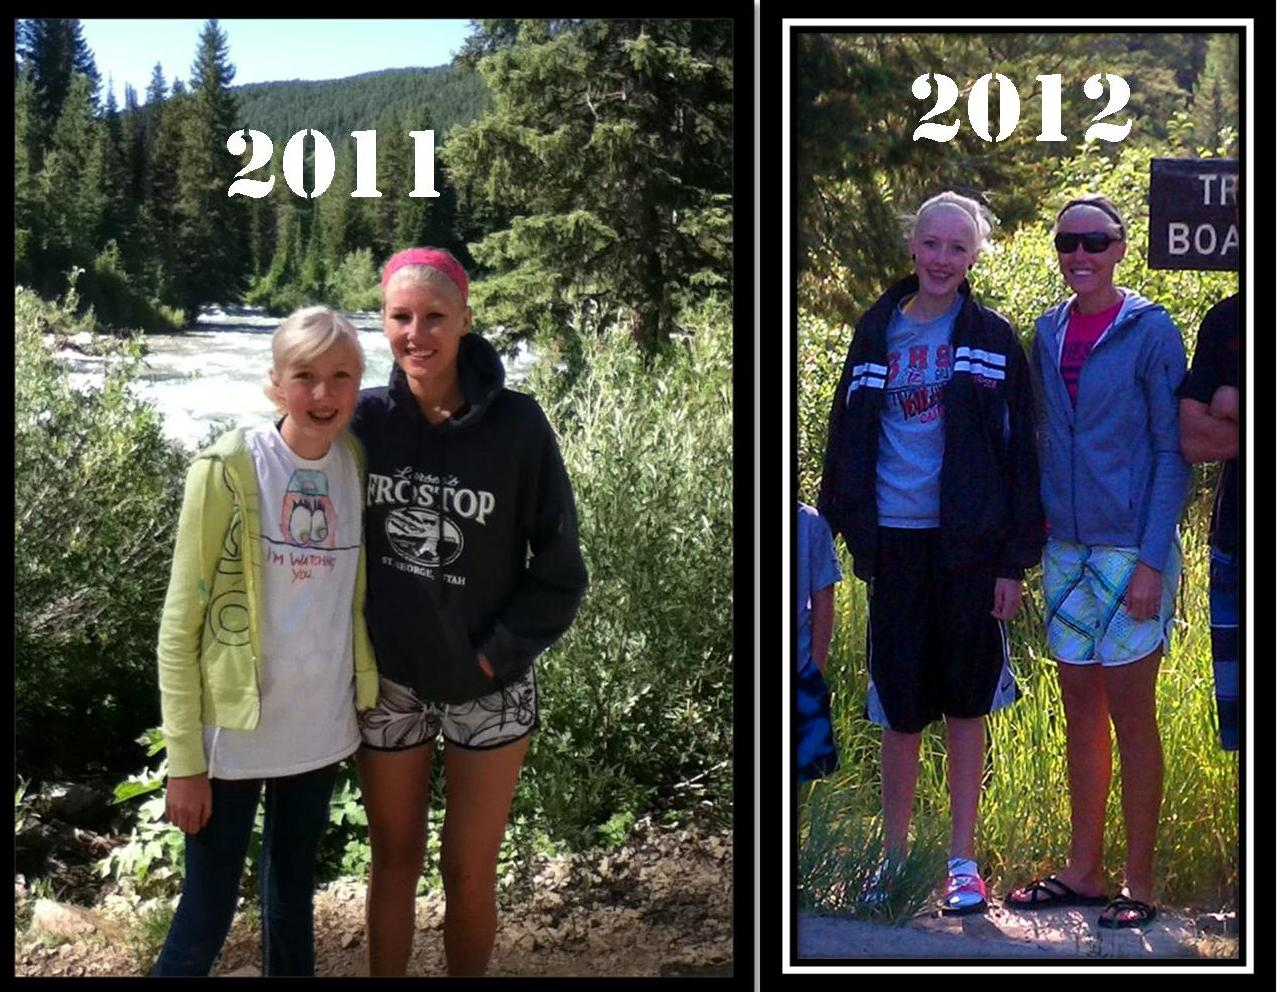 She Grew Taller Heels Related Keywords & Suggestions - She Grew